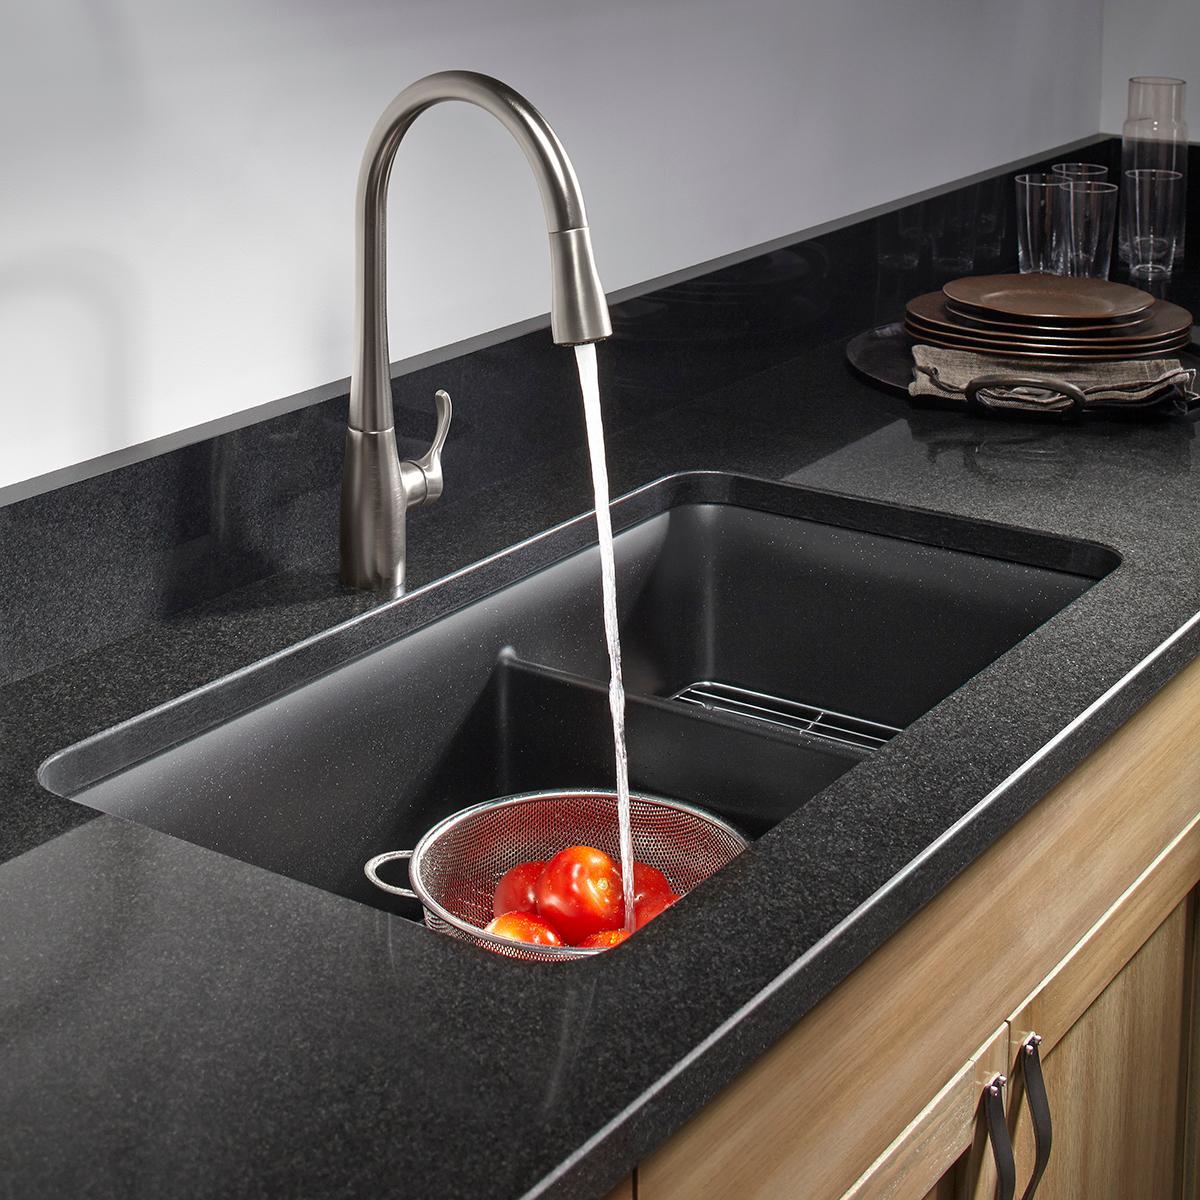 Kohler K 8204 Cm1 Cairn Undermount Double Bowl Kitchen